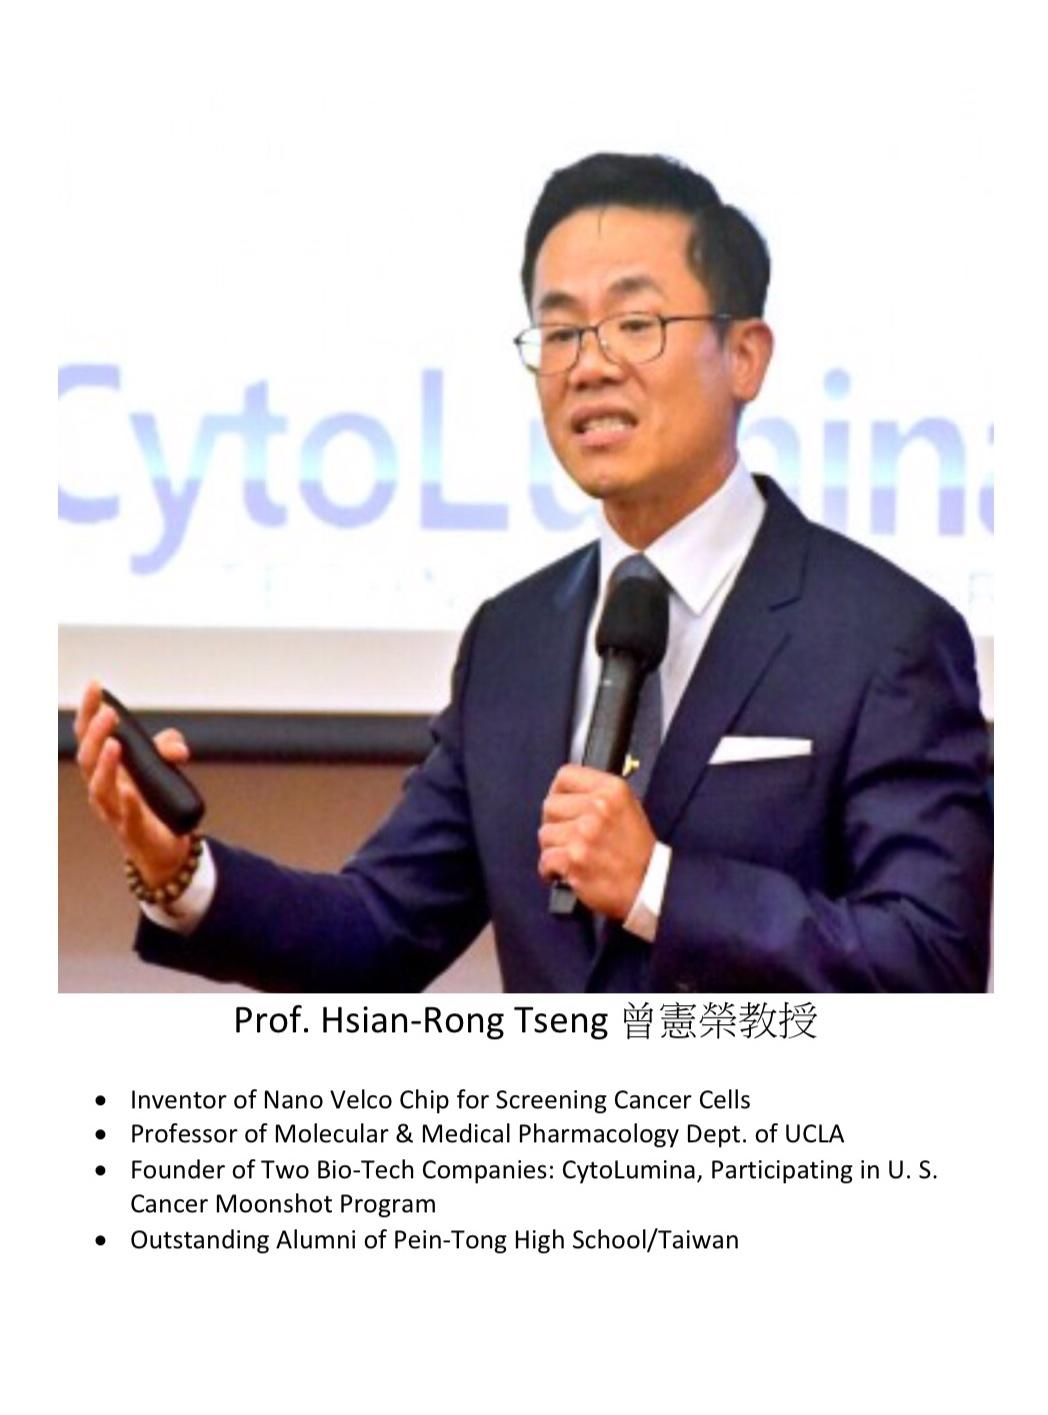 283. Prof. Hsian-Rong Tseng 曾憲榮教授